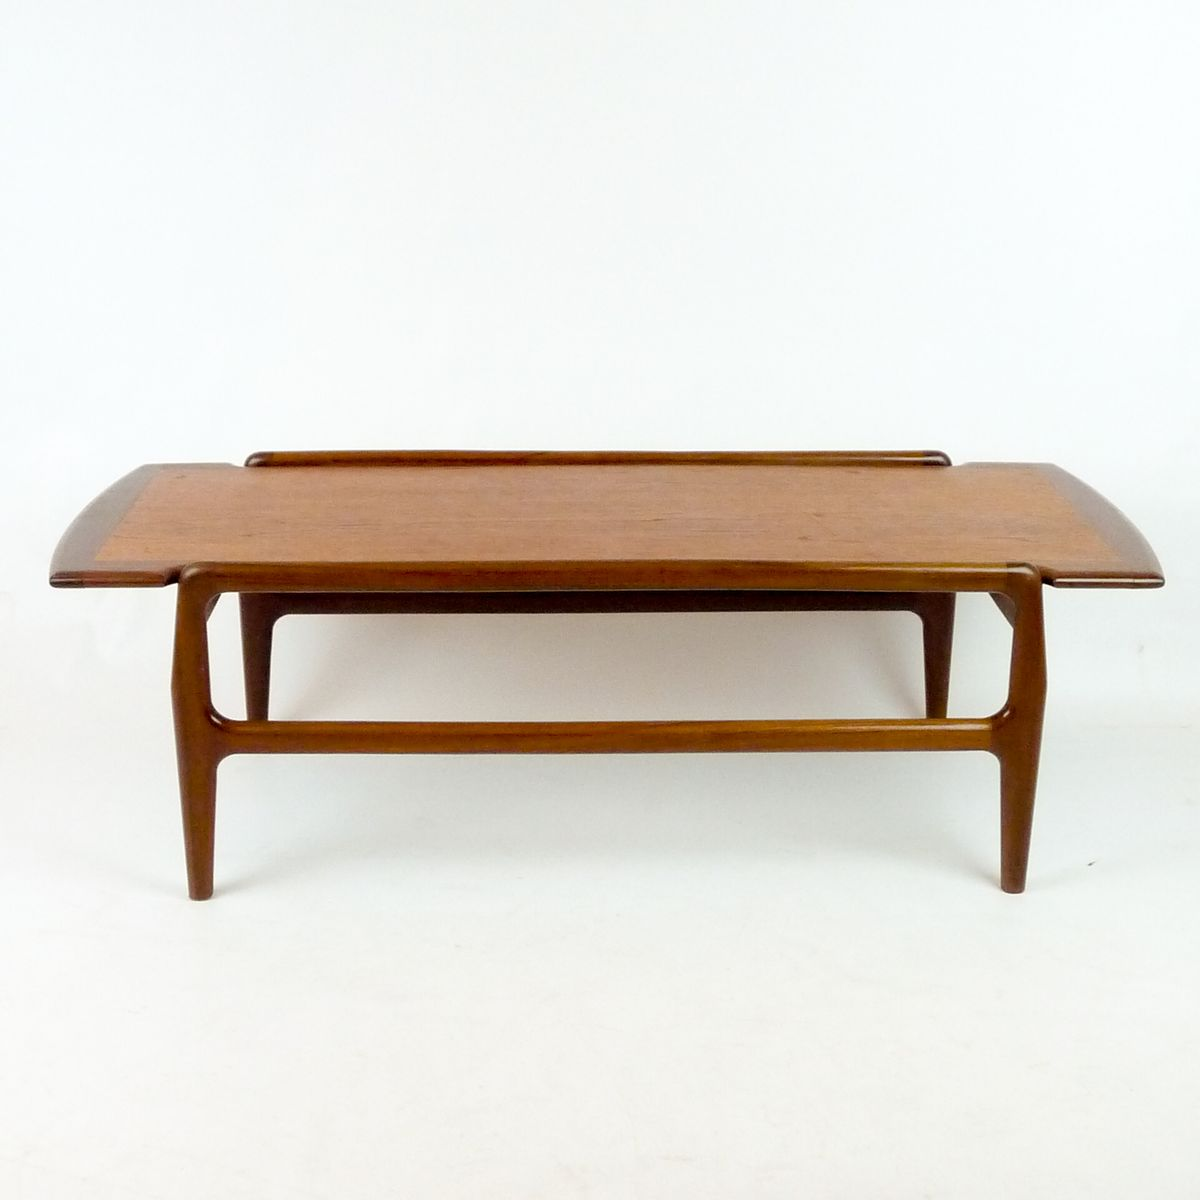 Scandinavian teak coffee table 1950s for sale at pamono for Teak coffee table